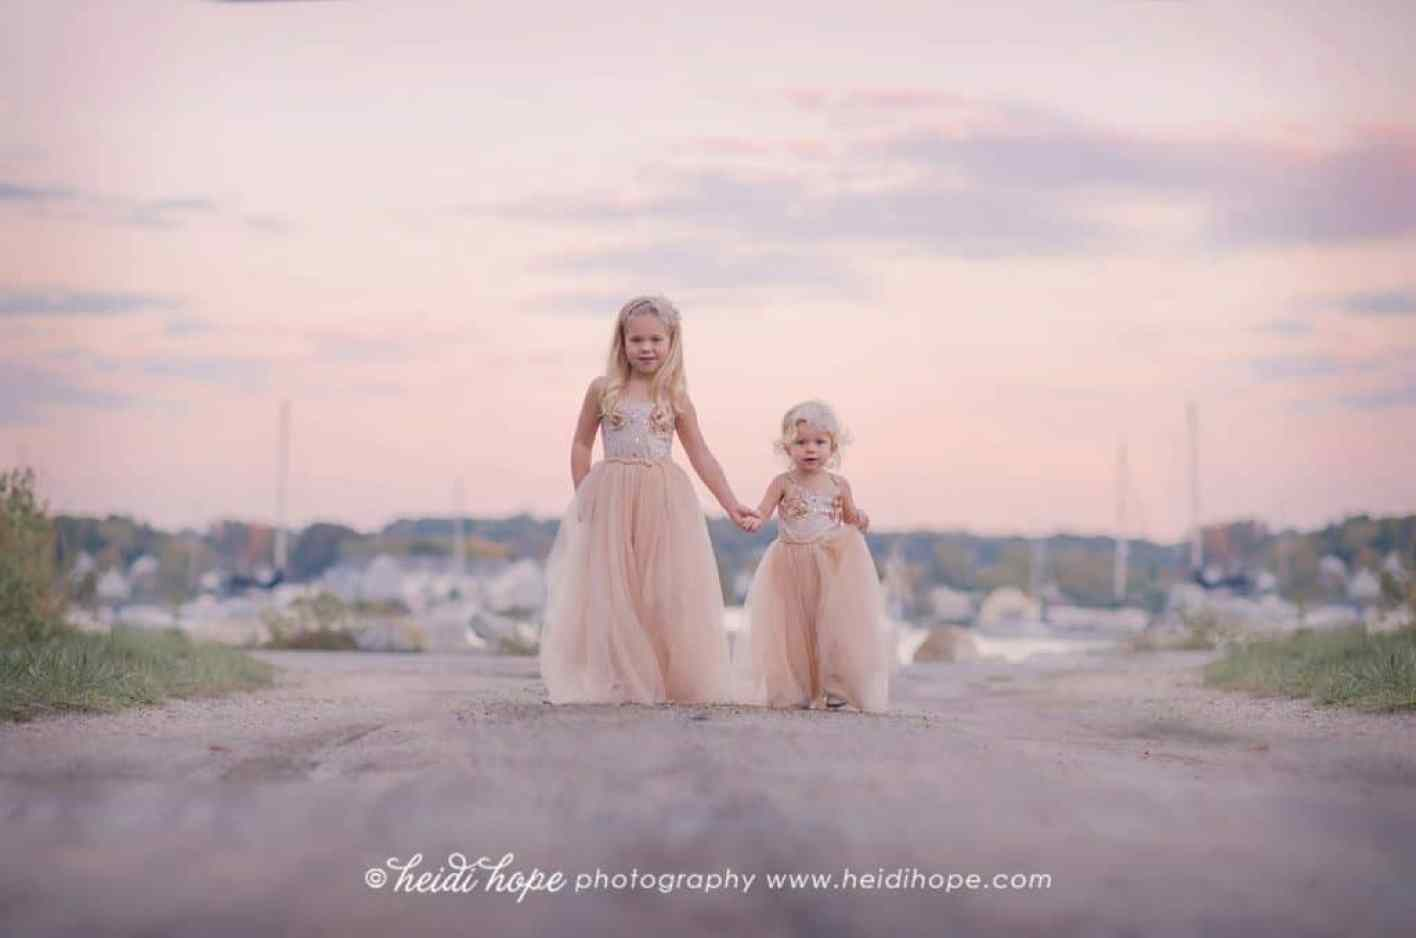 Heidi Hope Photography in Cranston, Rhode Island